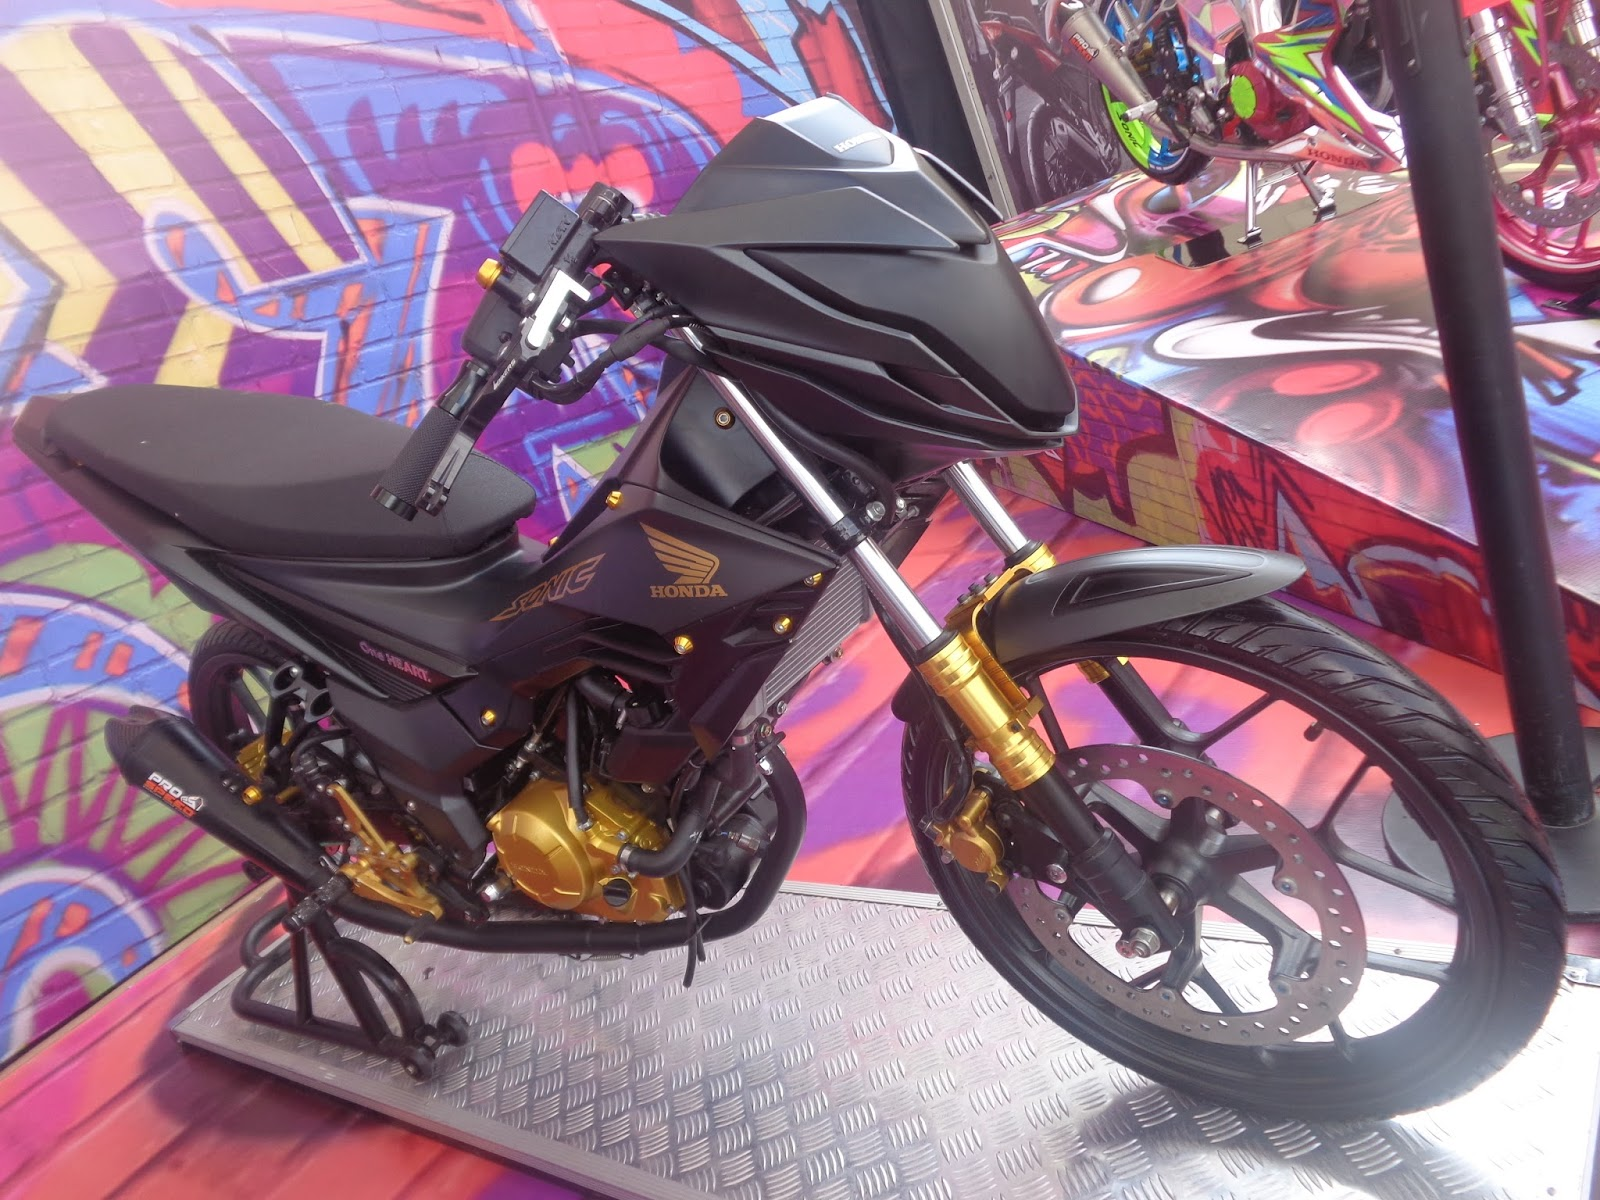 Modifikasi Motor Honda Sonic Terupdate 150r Aggresso Matte Black Boyolali Spied 150rdark Knight Tenan